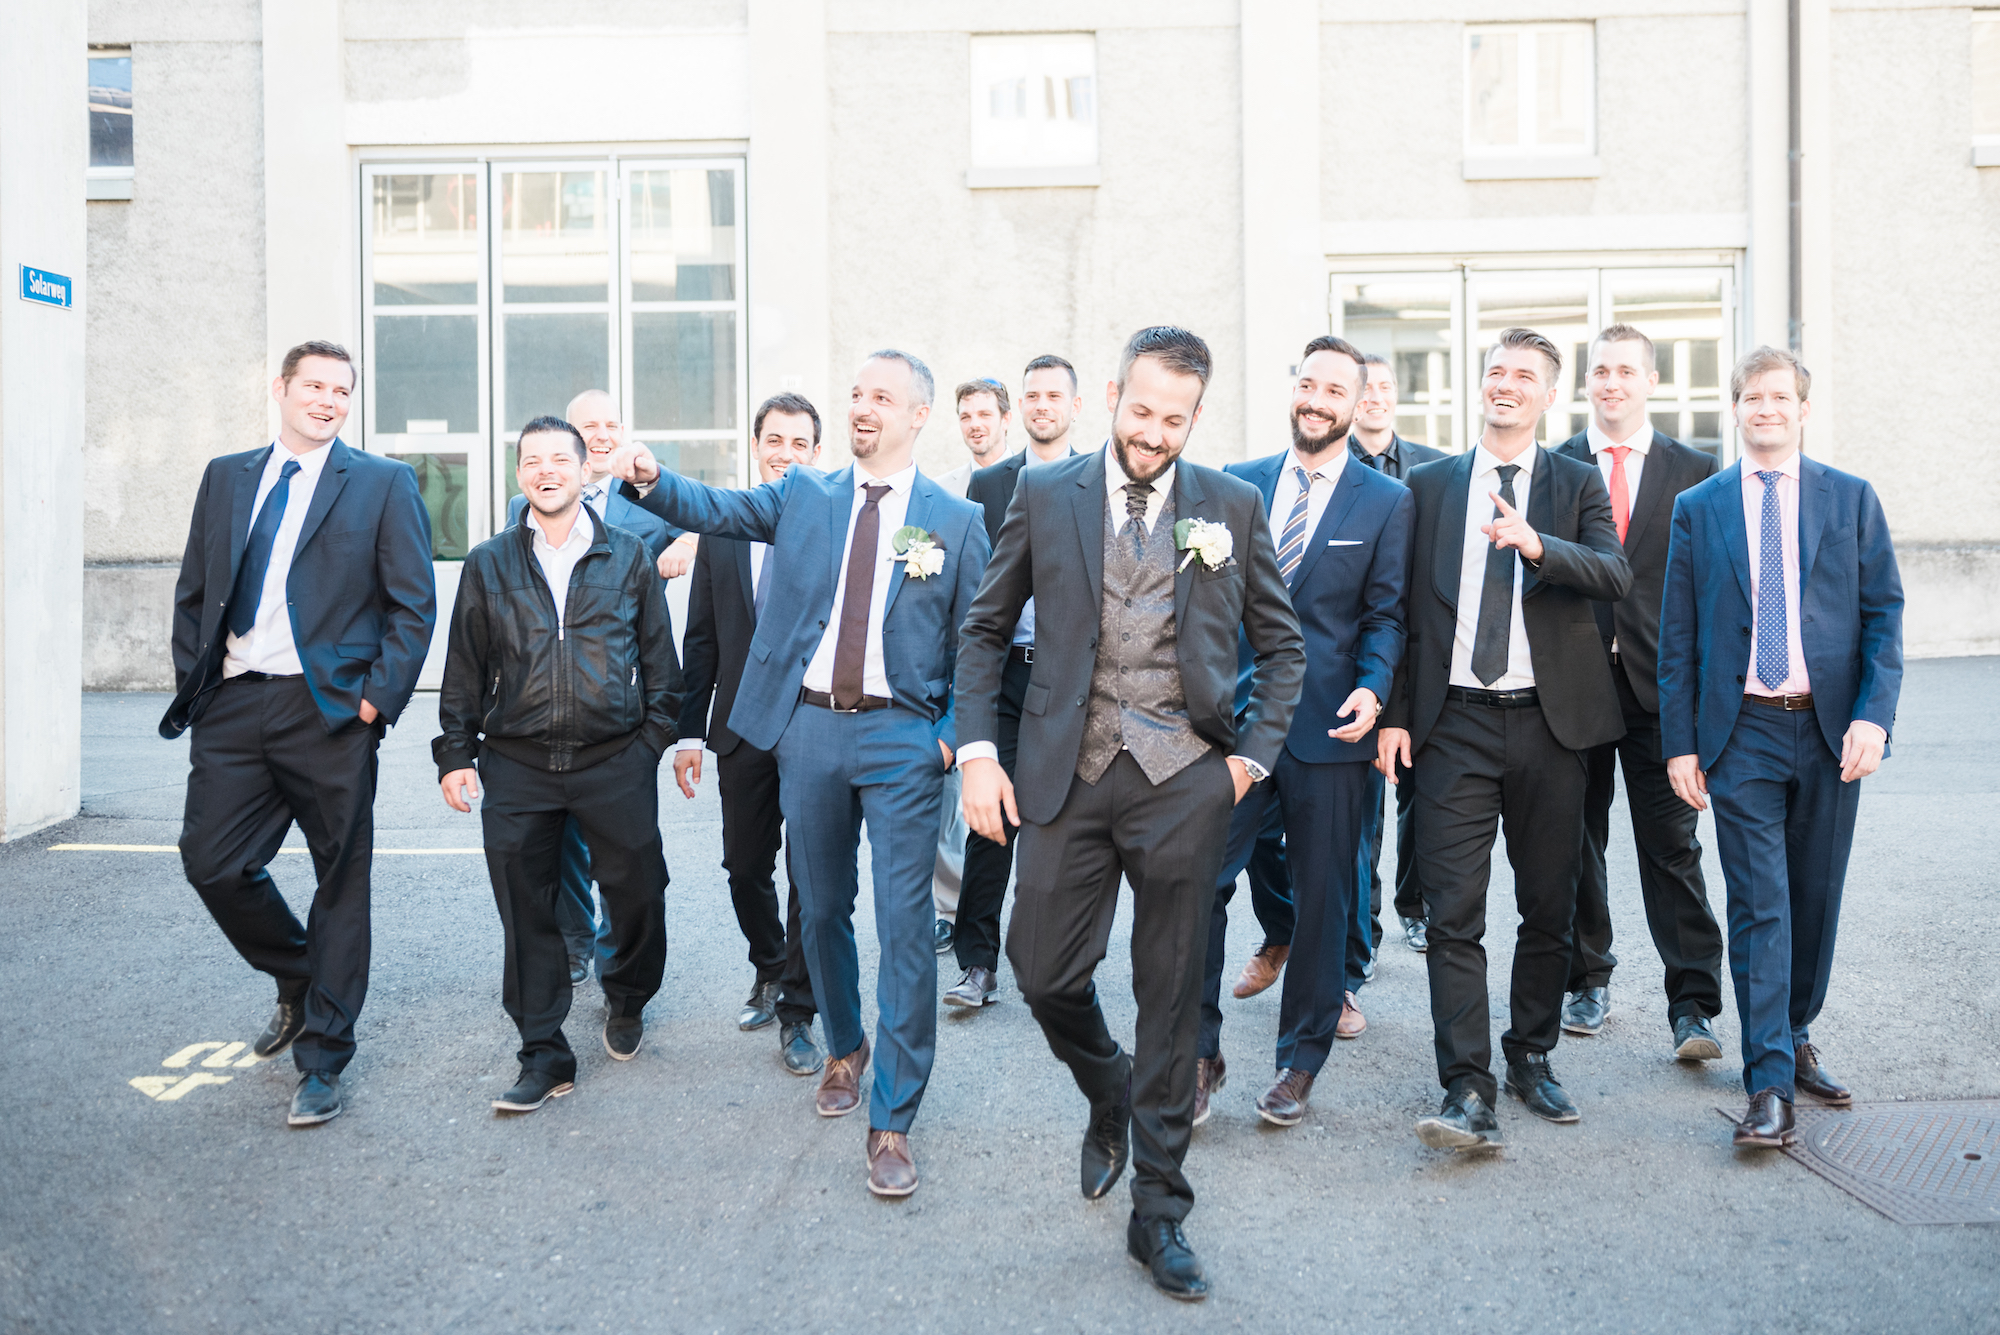 NadiaundMichael_Hochzeit_BekaBitterliFotografie_676.jpg